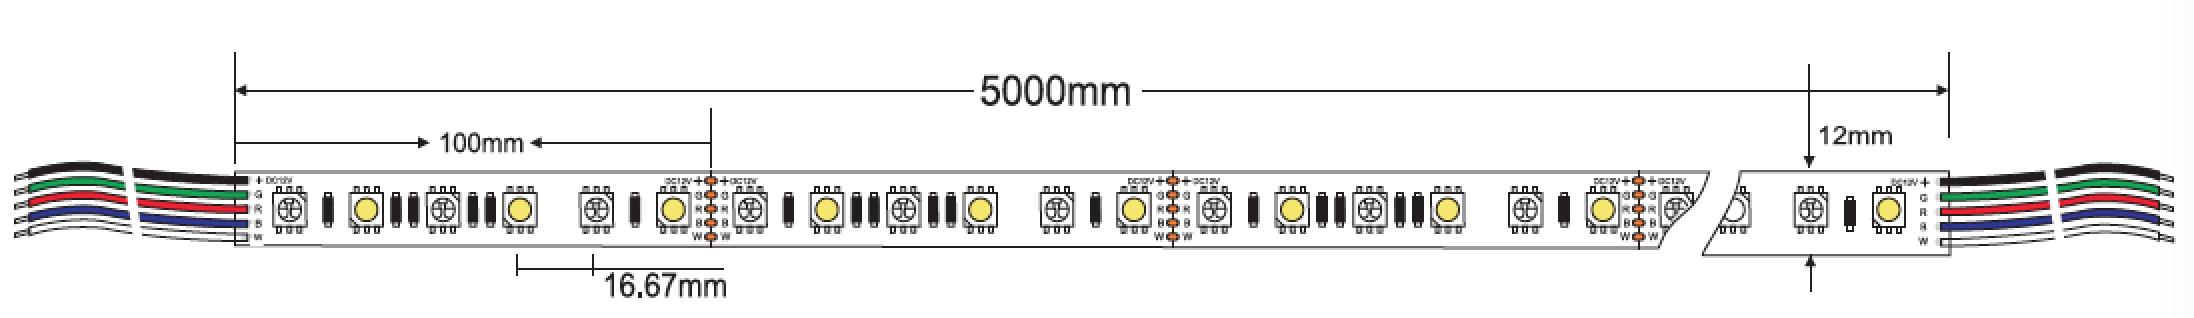 TLT-LX-178080 line drawing